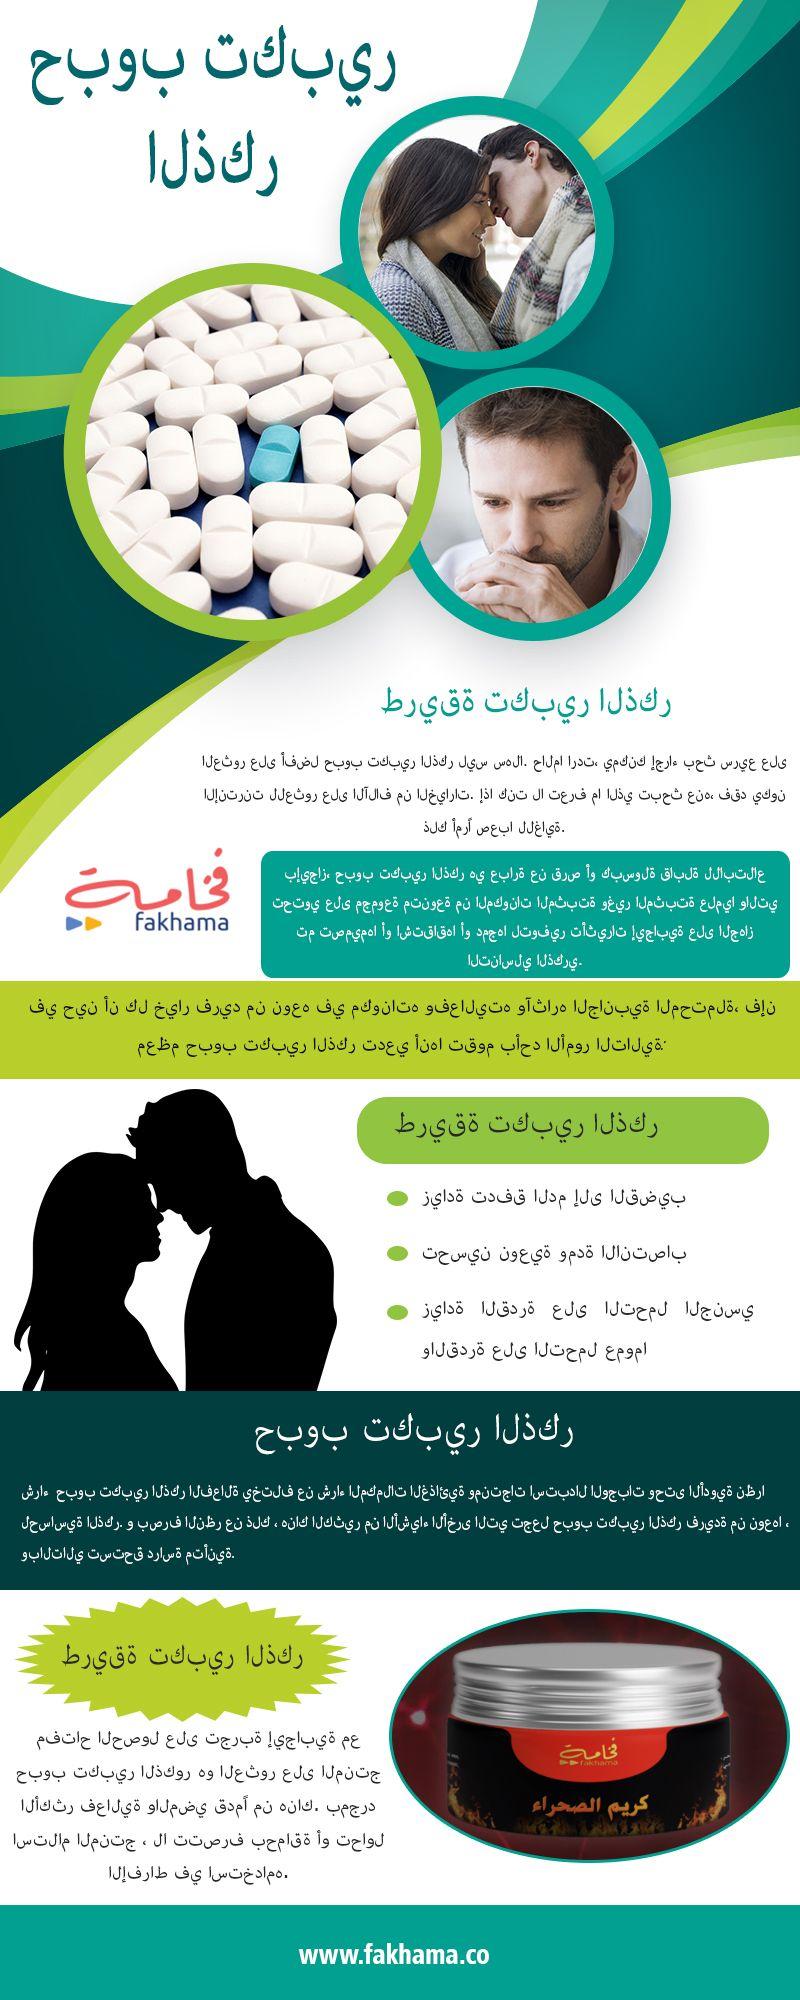 حبوب تكبير الذكر Www Fakhama Co Poster Movie Posters Pandora Screenshot